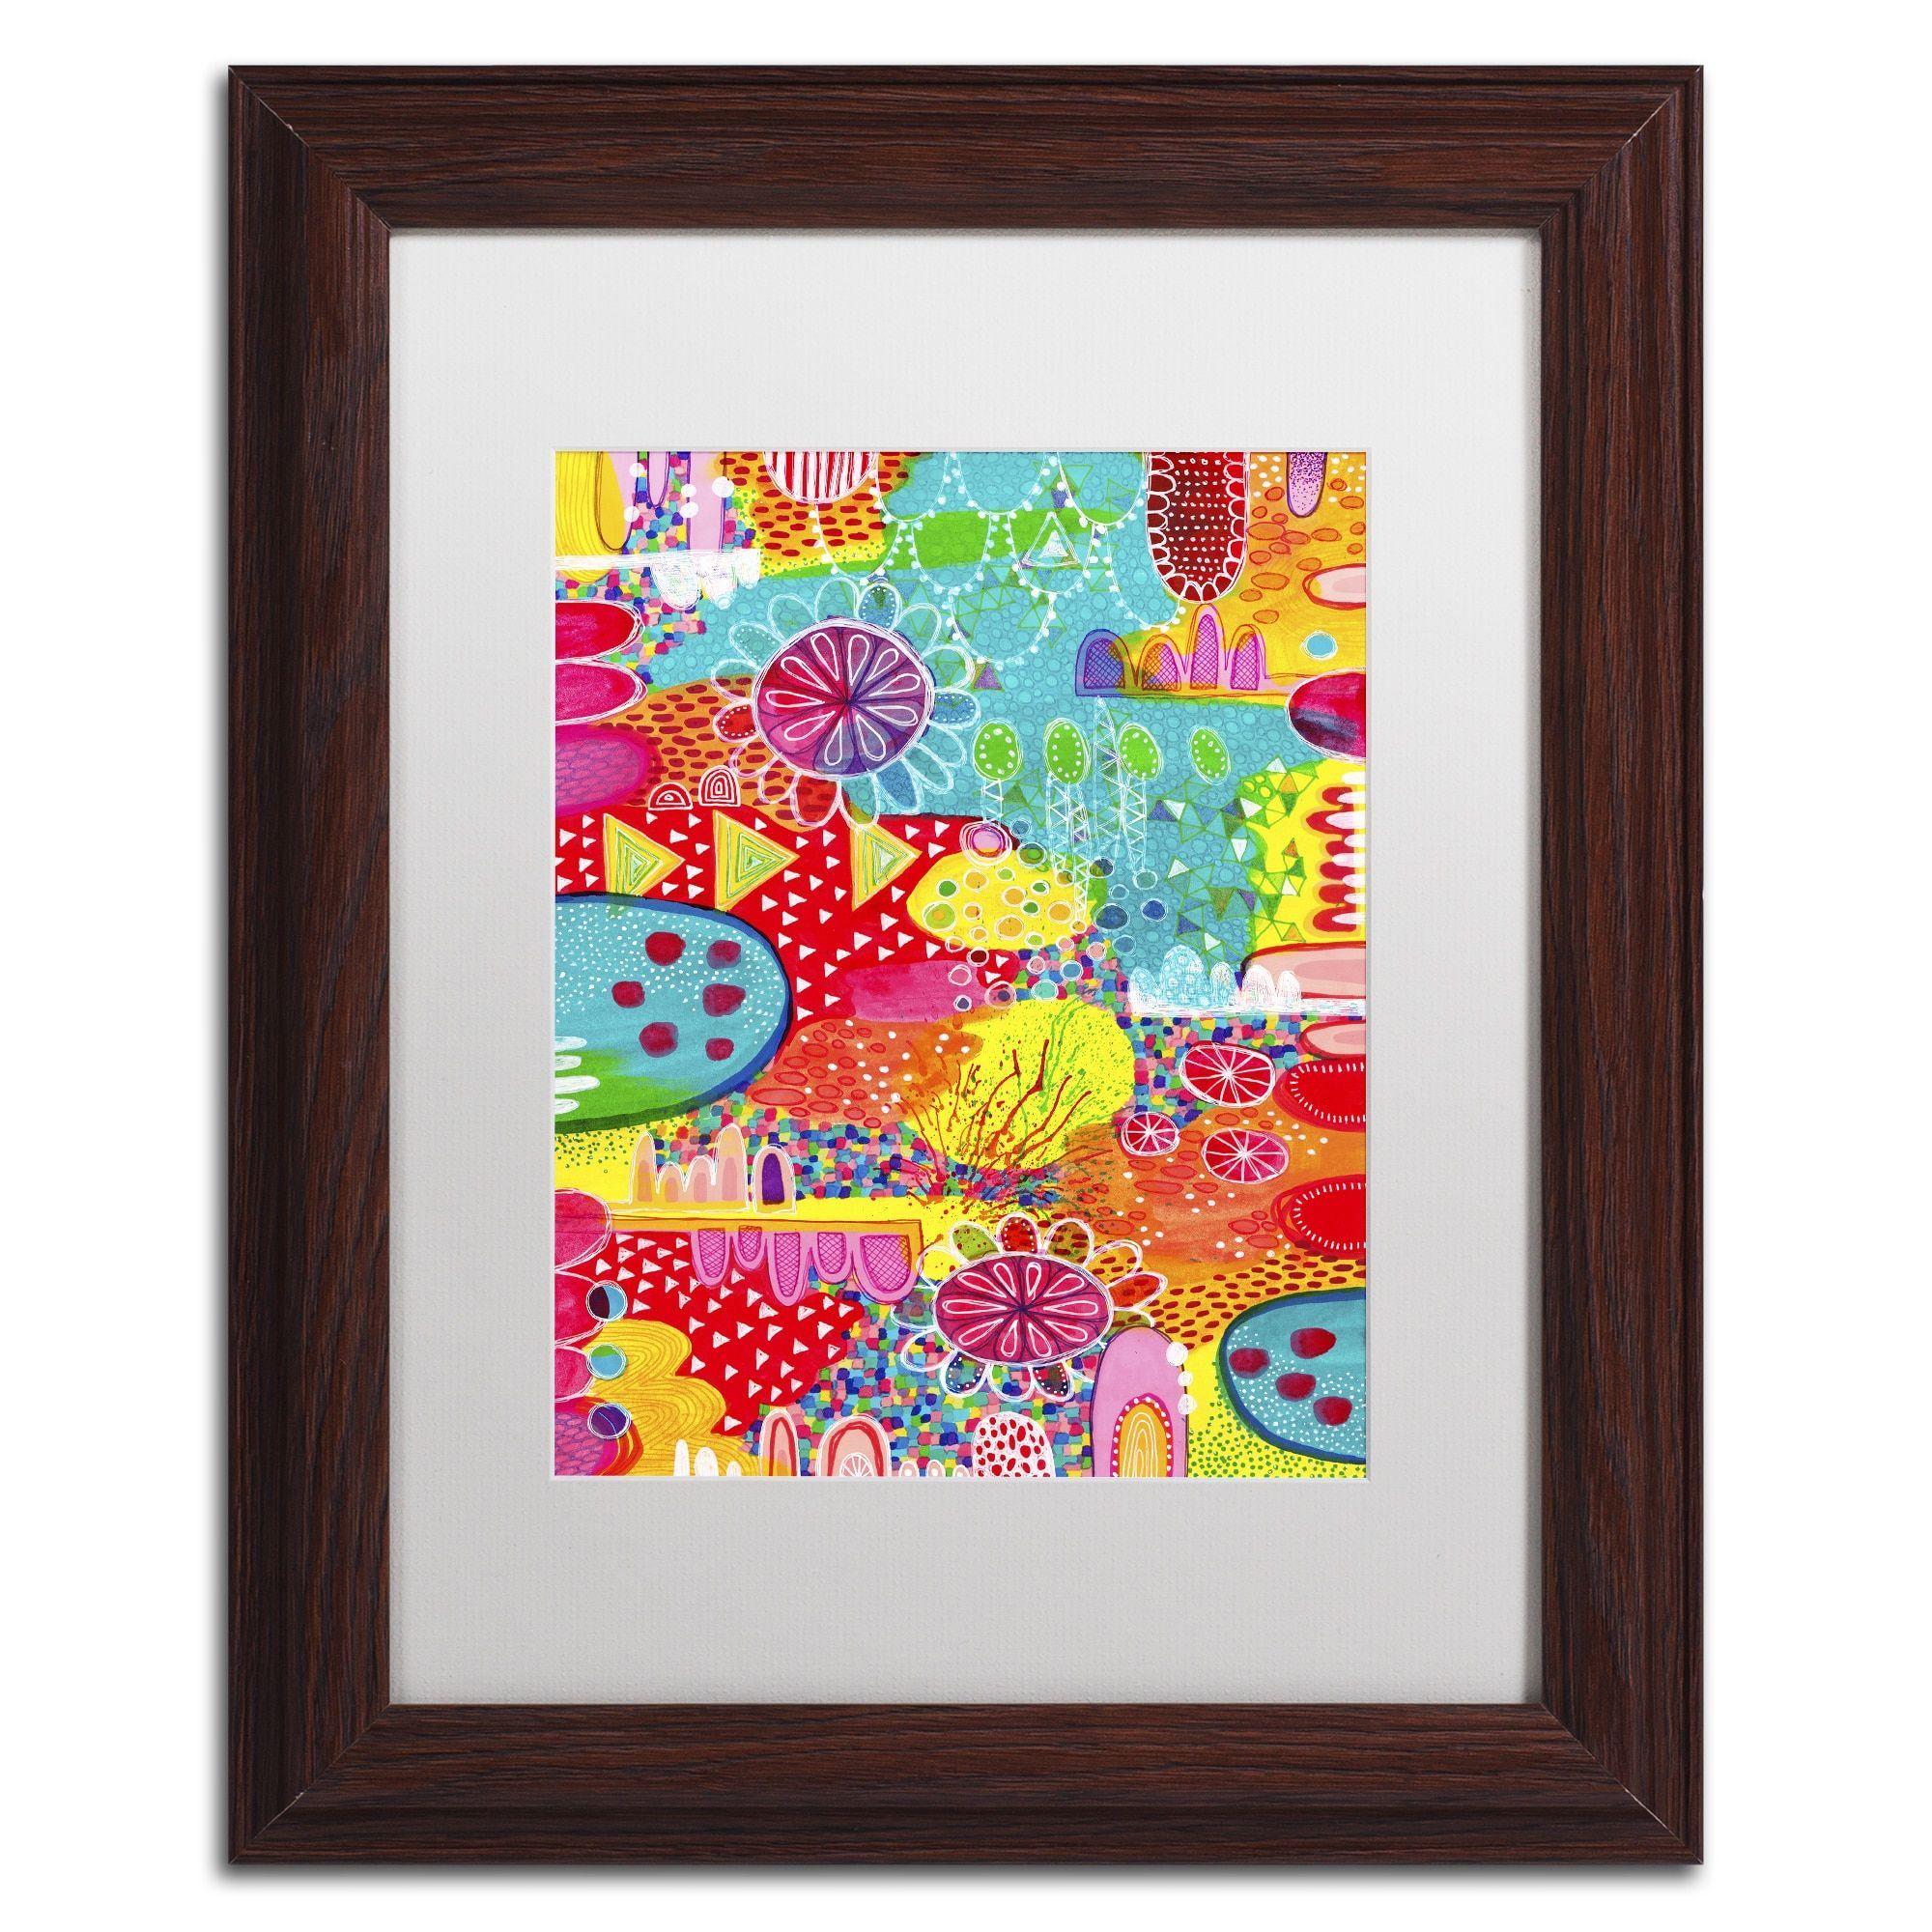 Hello Angel 'Sunshine and Lollipops' Matted Framed Art